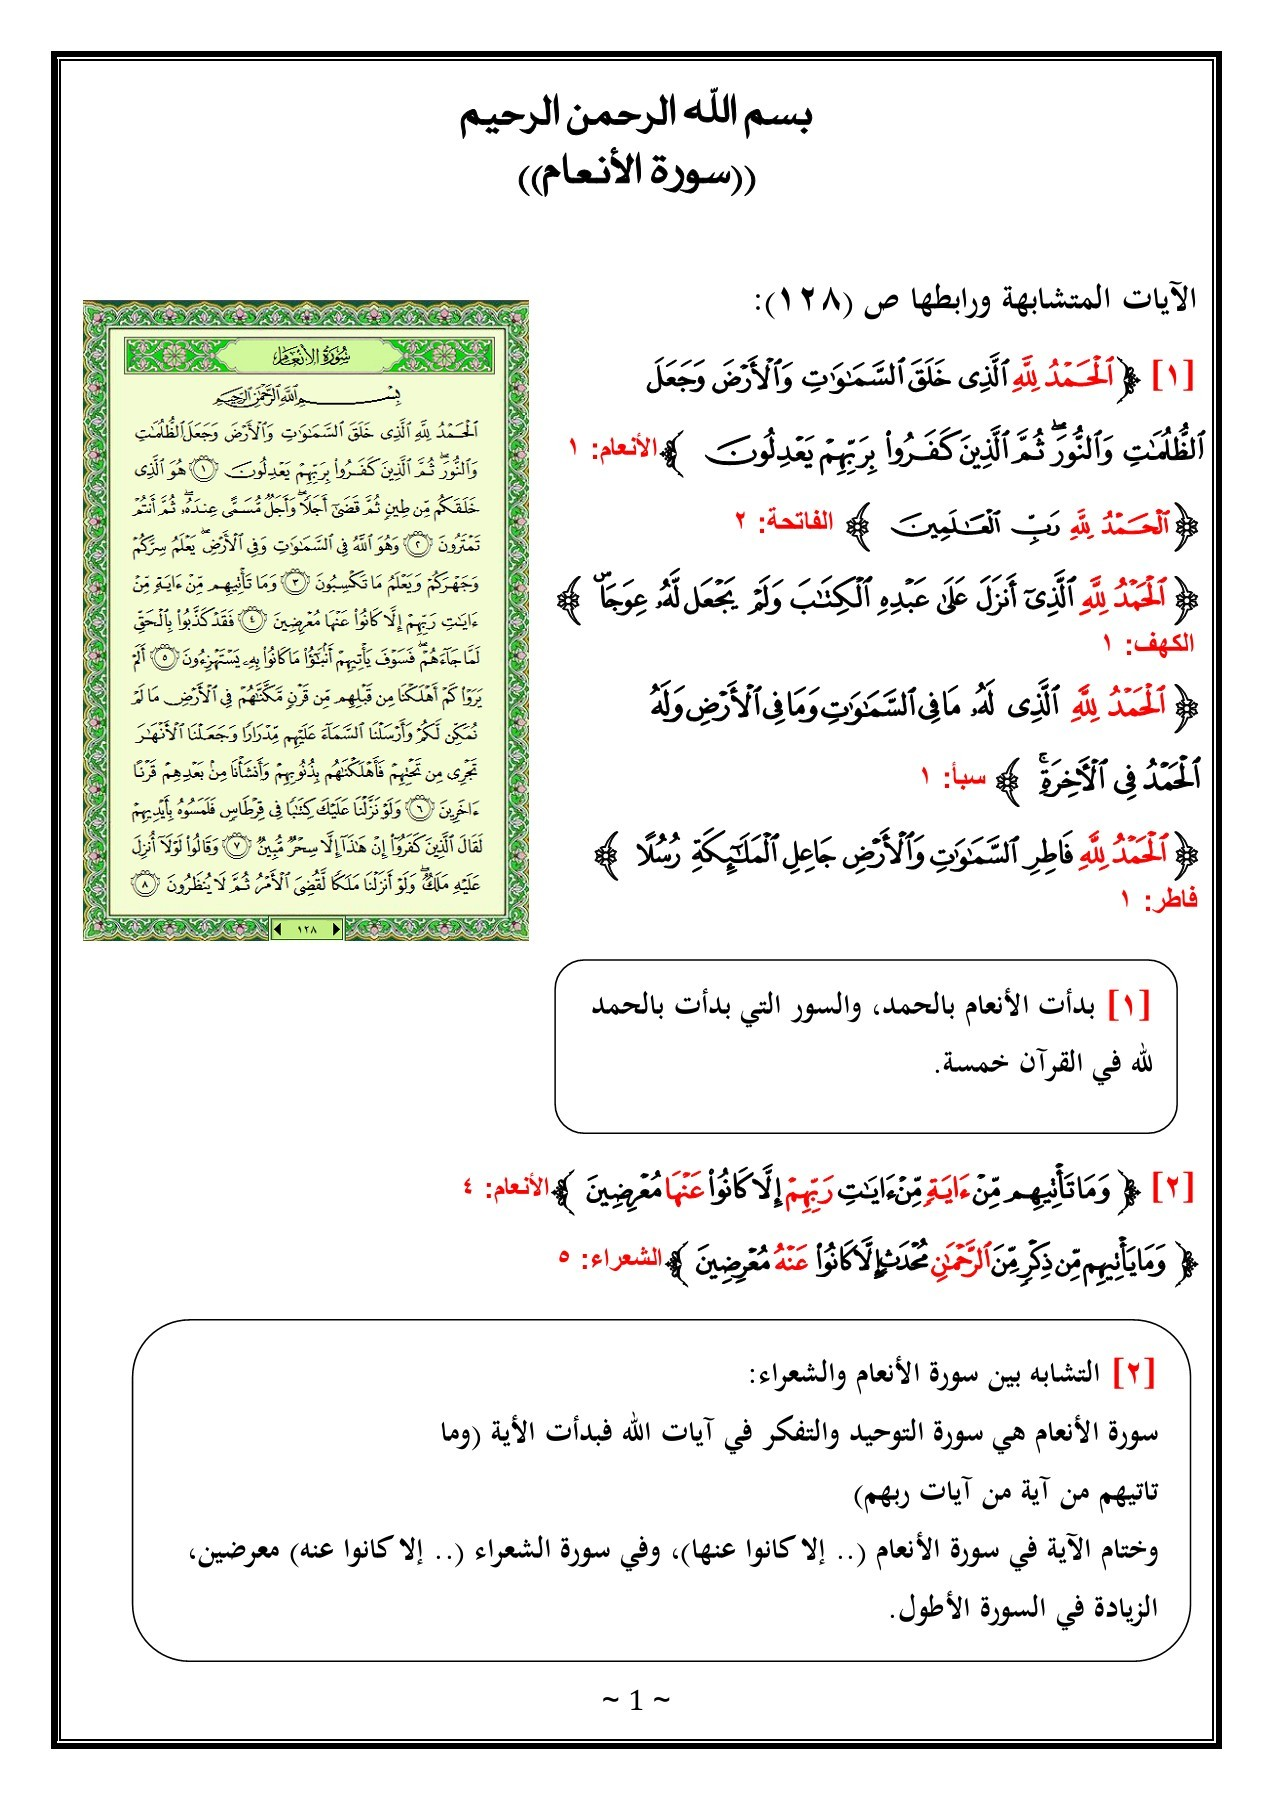 006 متشابهات سورة الأنعام Pdf Flip Book Pages 1 36 Pubhtml5